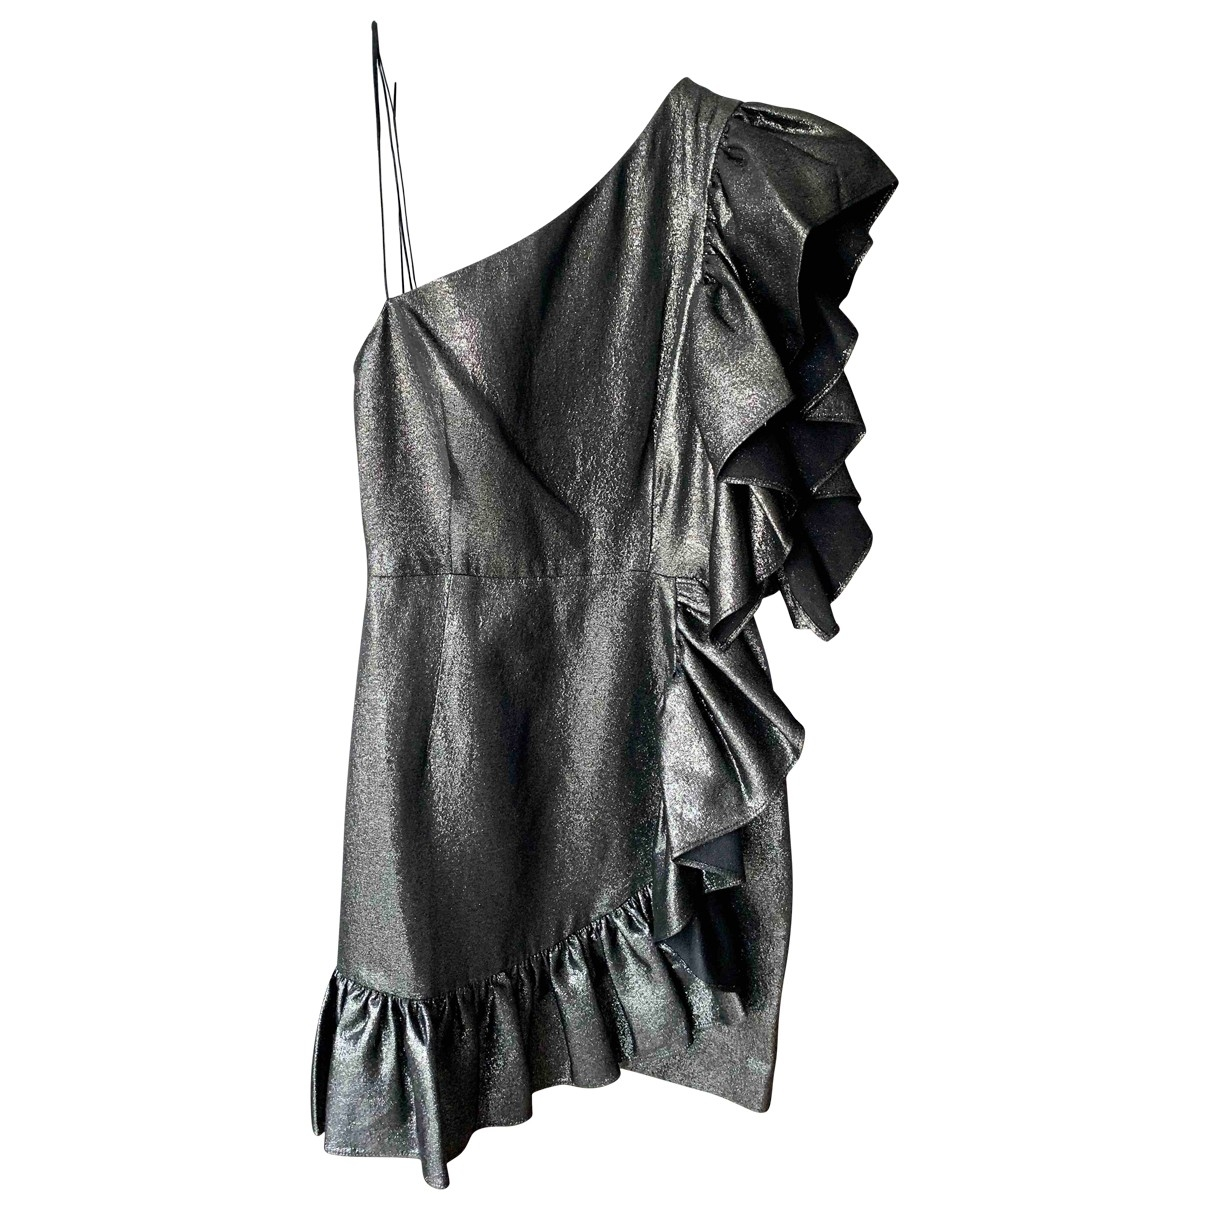 Sandro \N Anthracite Cotton dress for Women 1 0-5